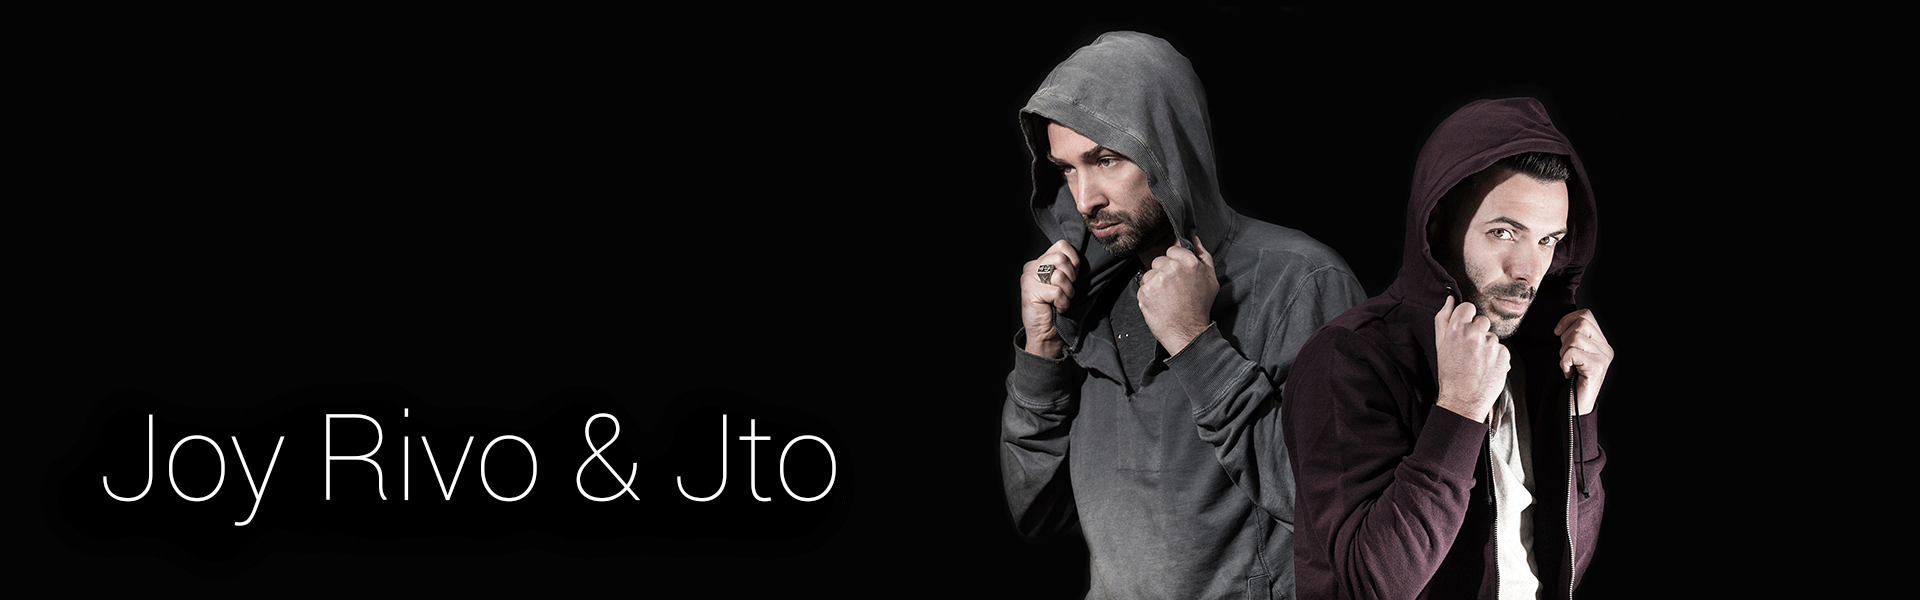 Banner of Joy Rivo & Jto